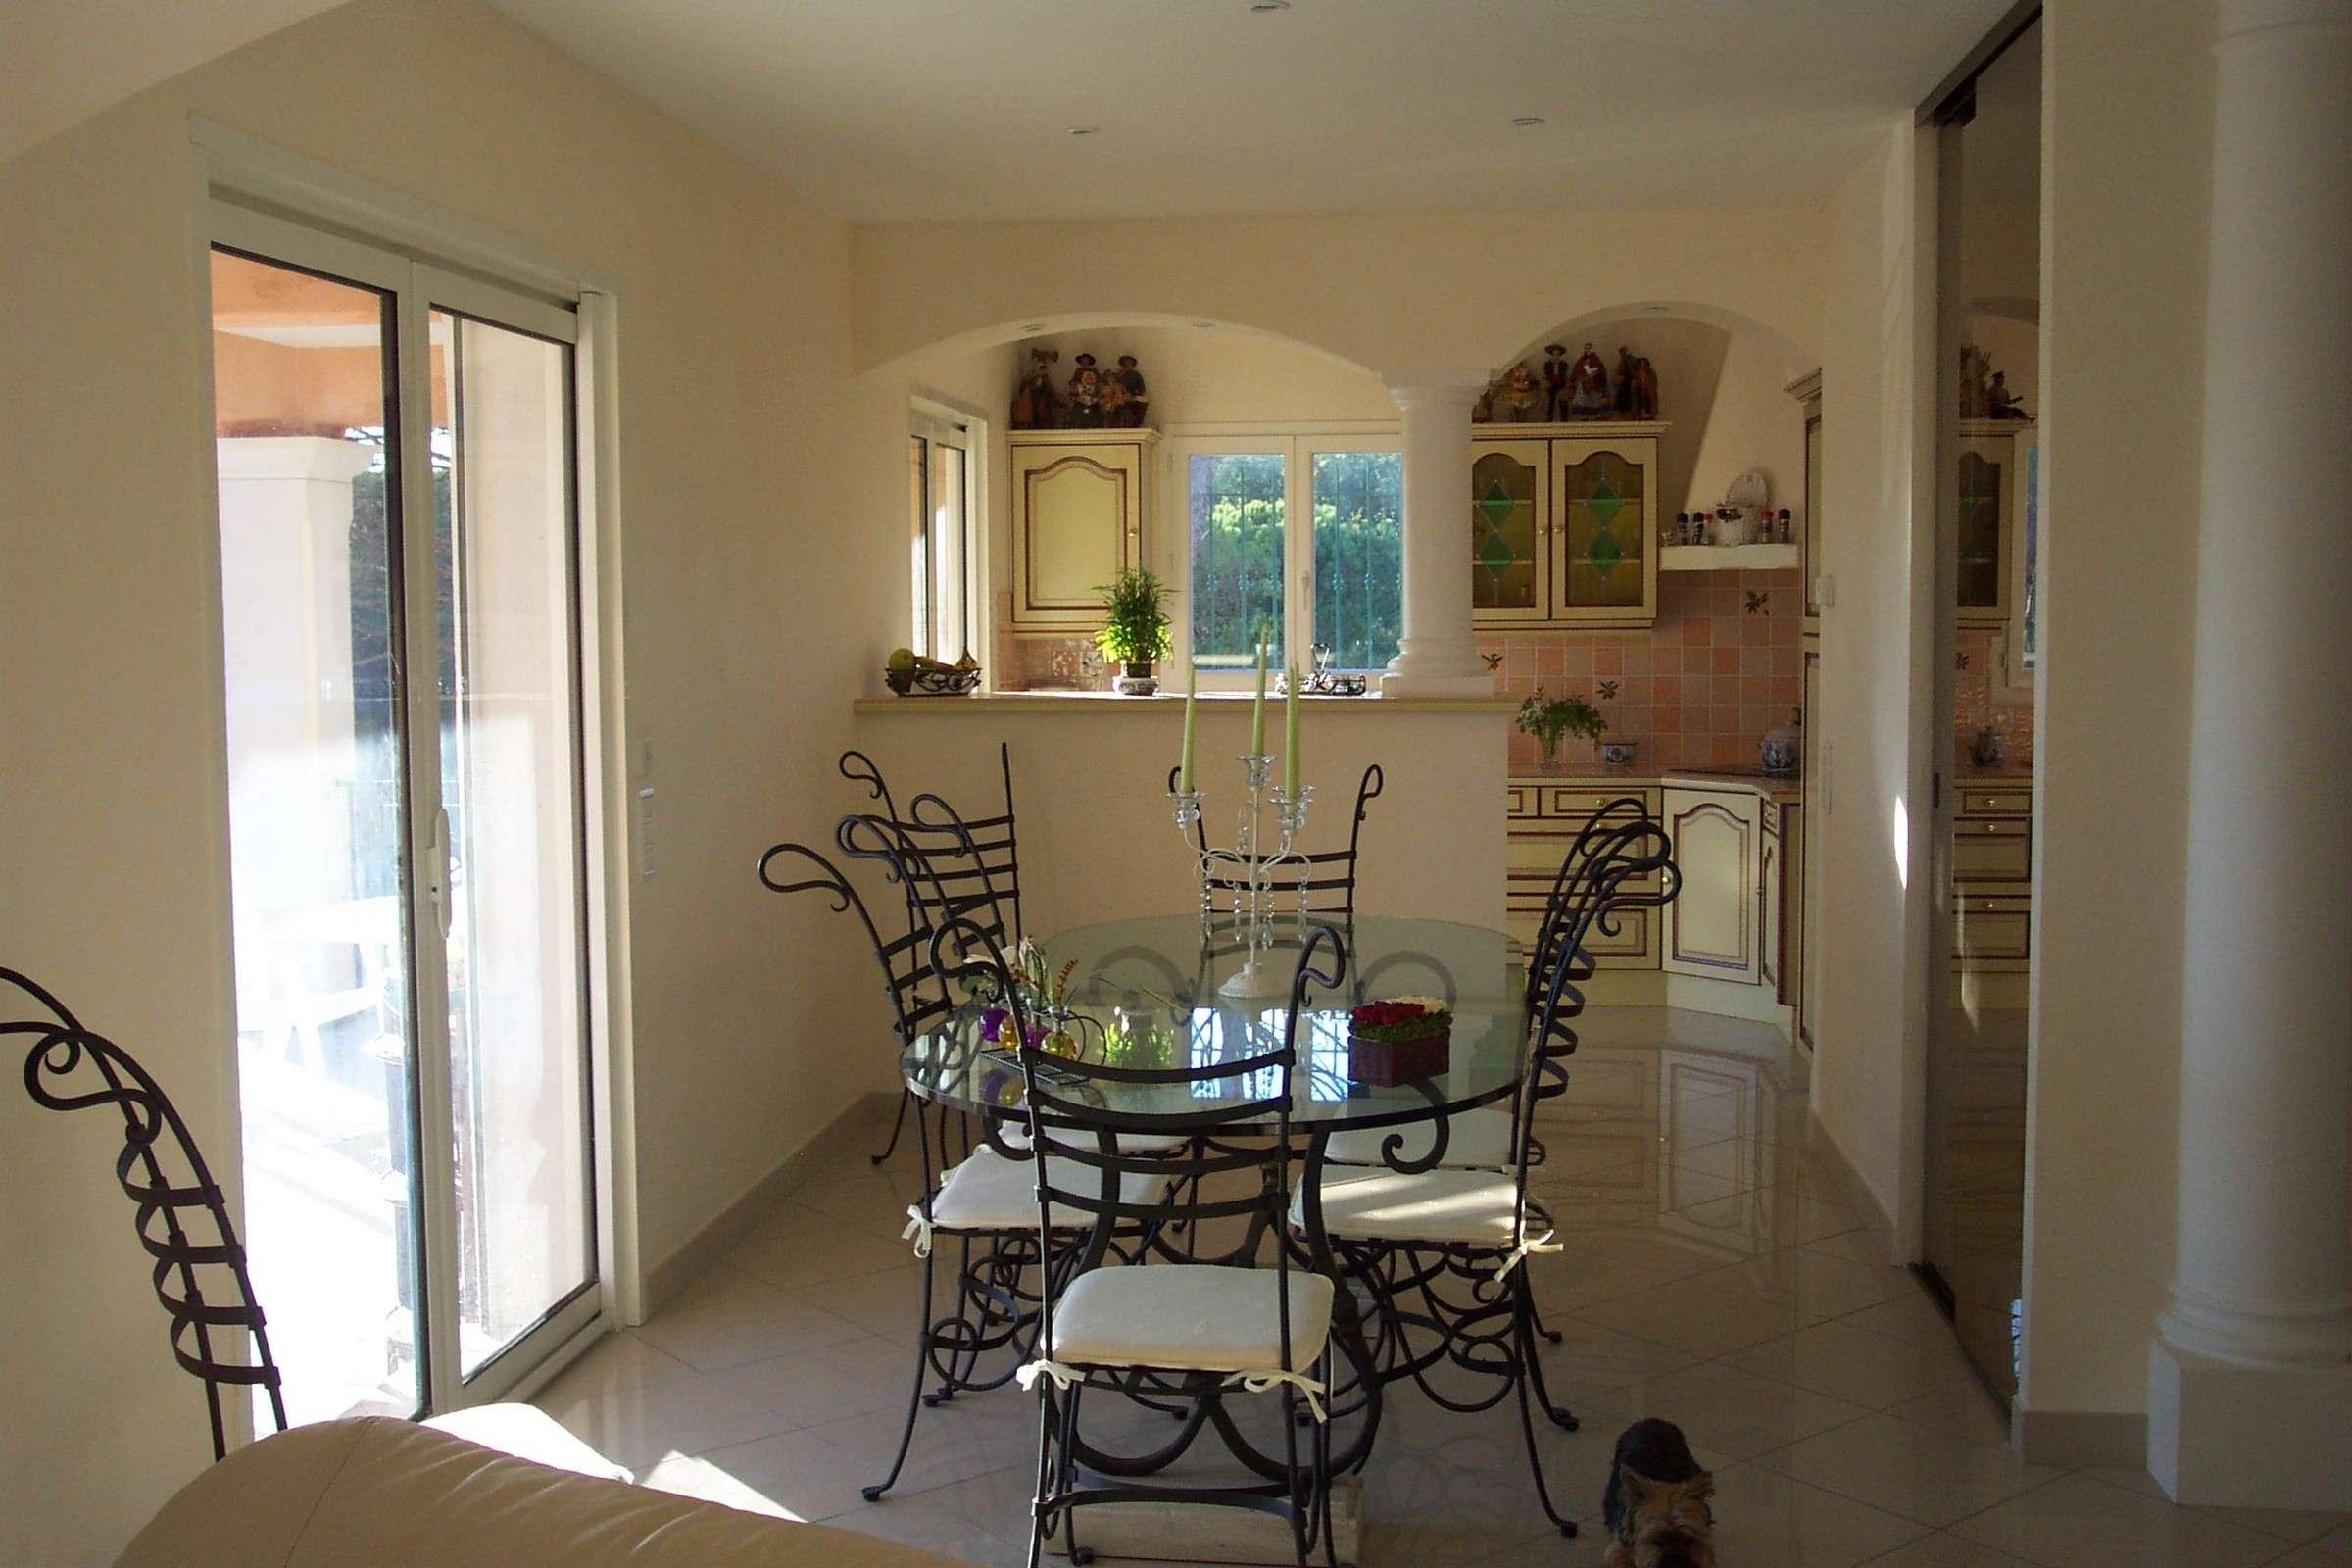 avant apr s nos relooking d 39 int rieur fr jus var hy res. Black Bedroom Furniture Sets. Home Design Ideas